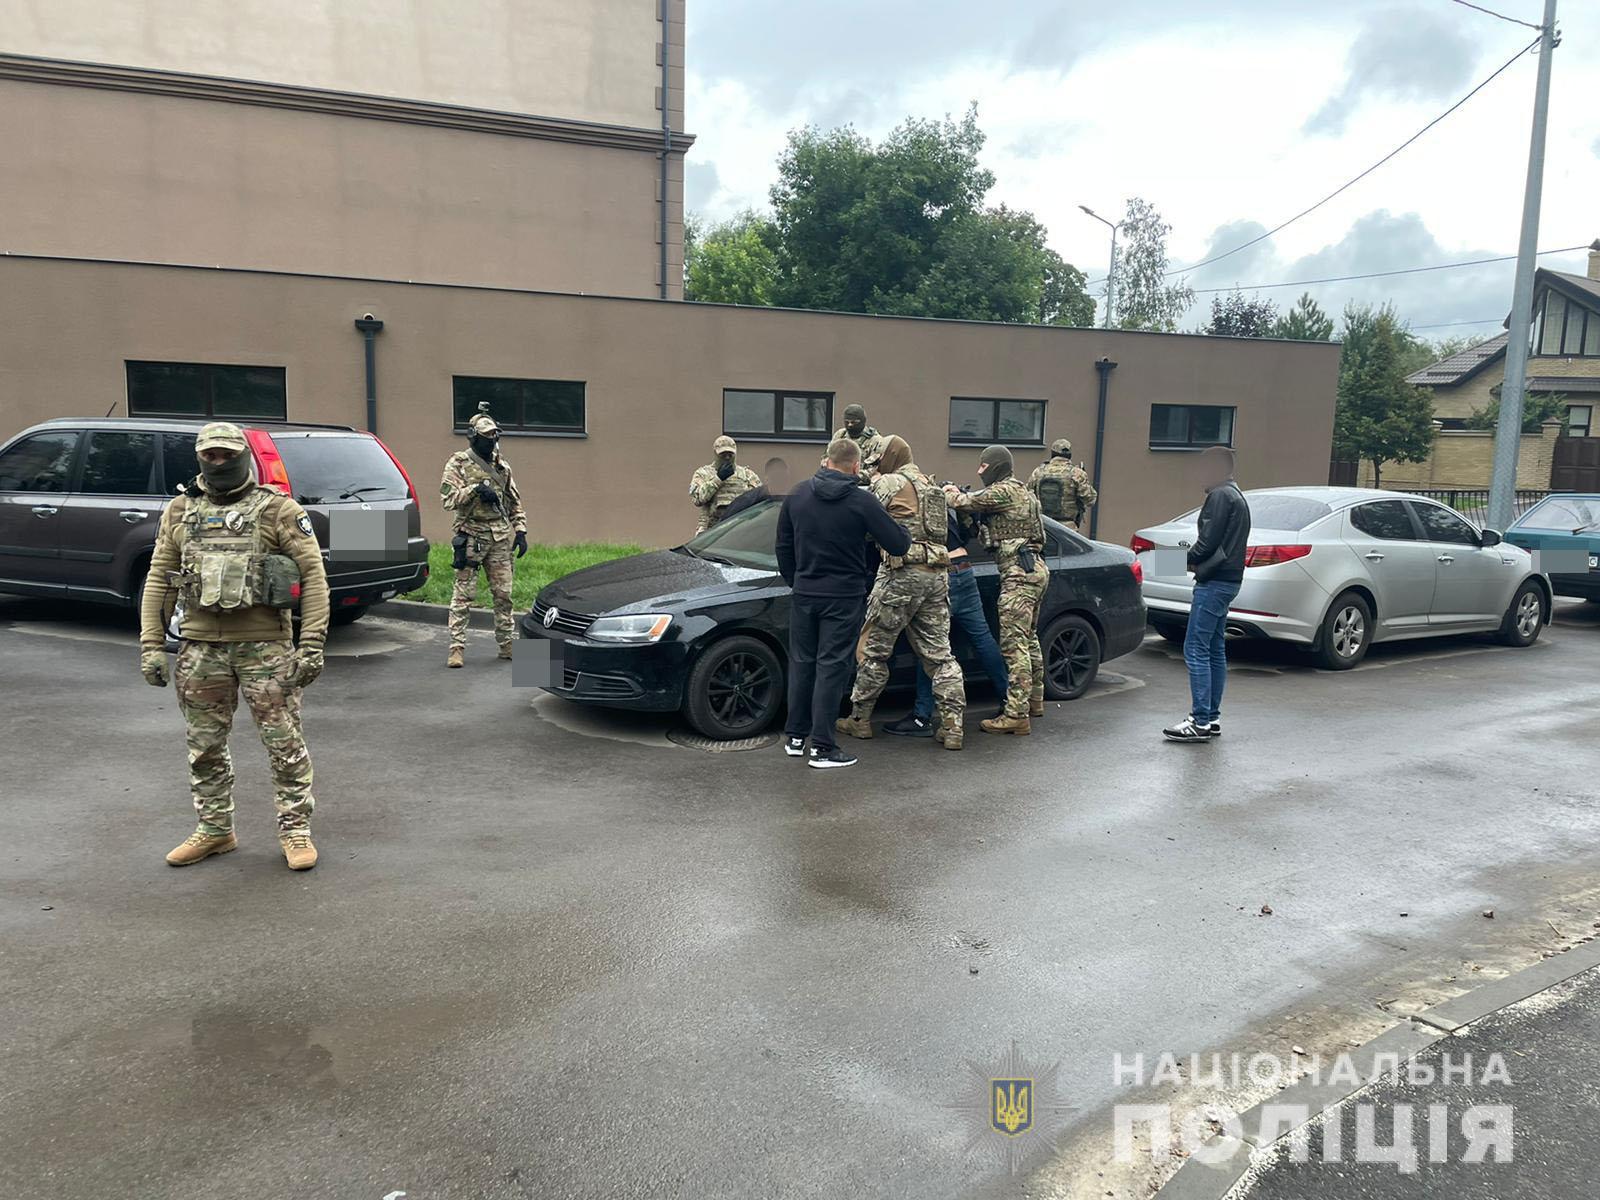 Оператор колл-центра торговал наркотиками. Новости Харькова